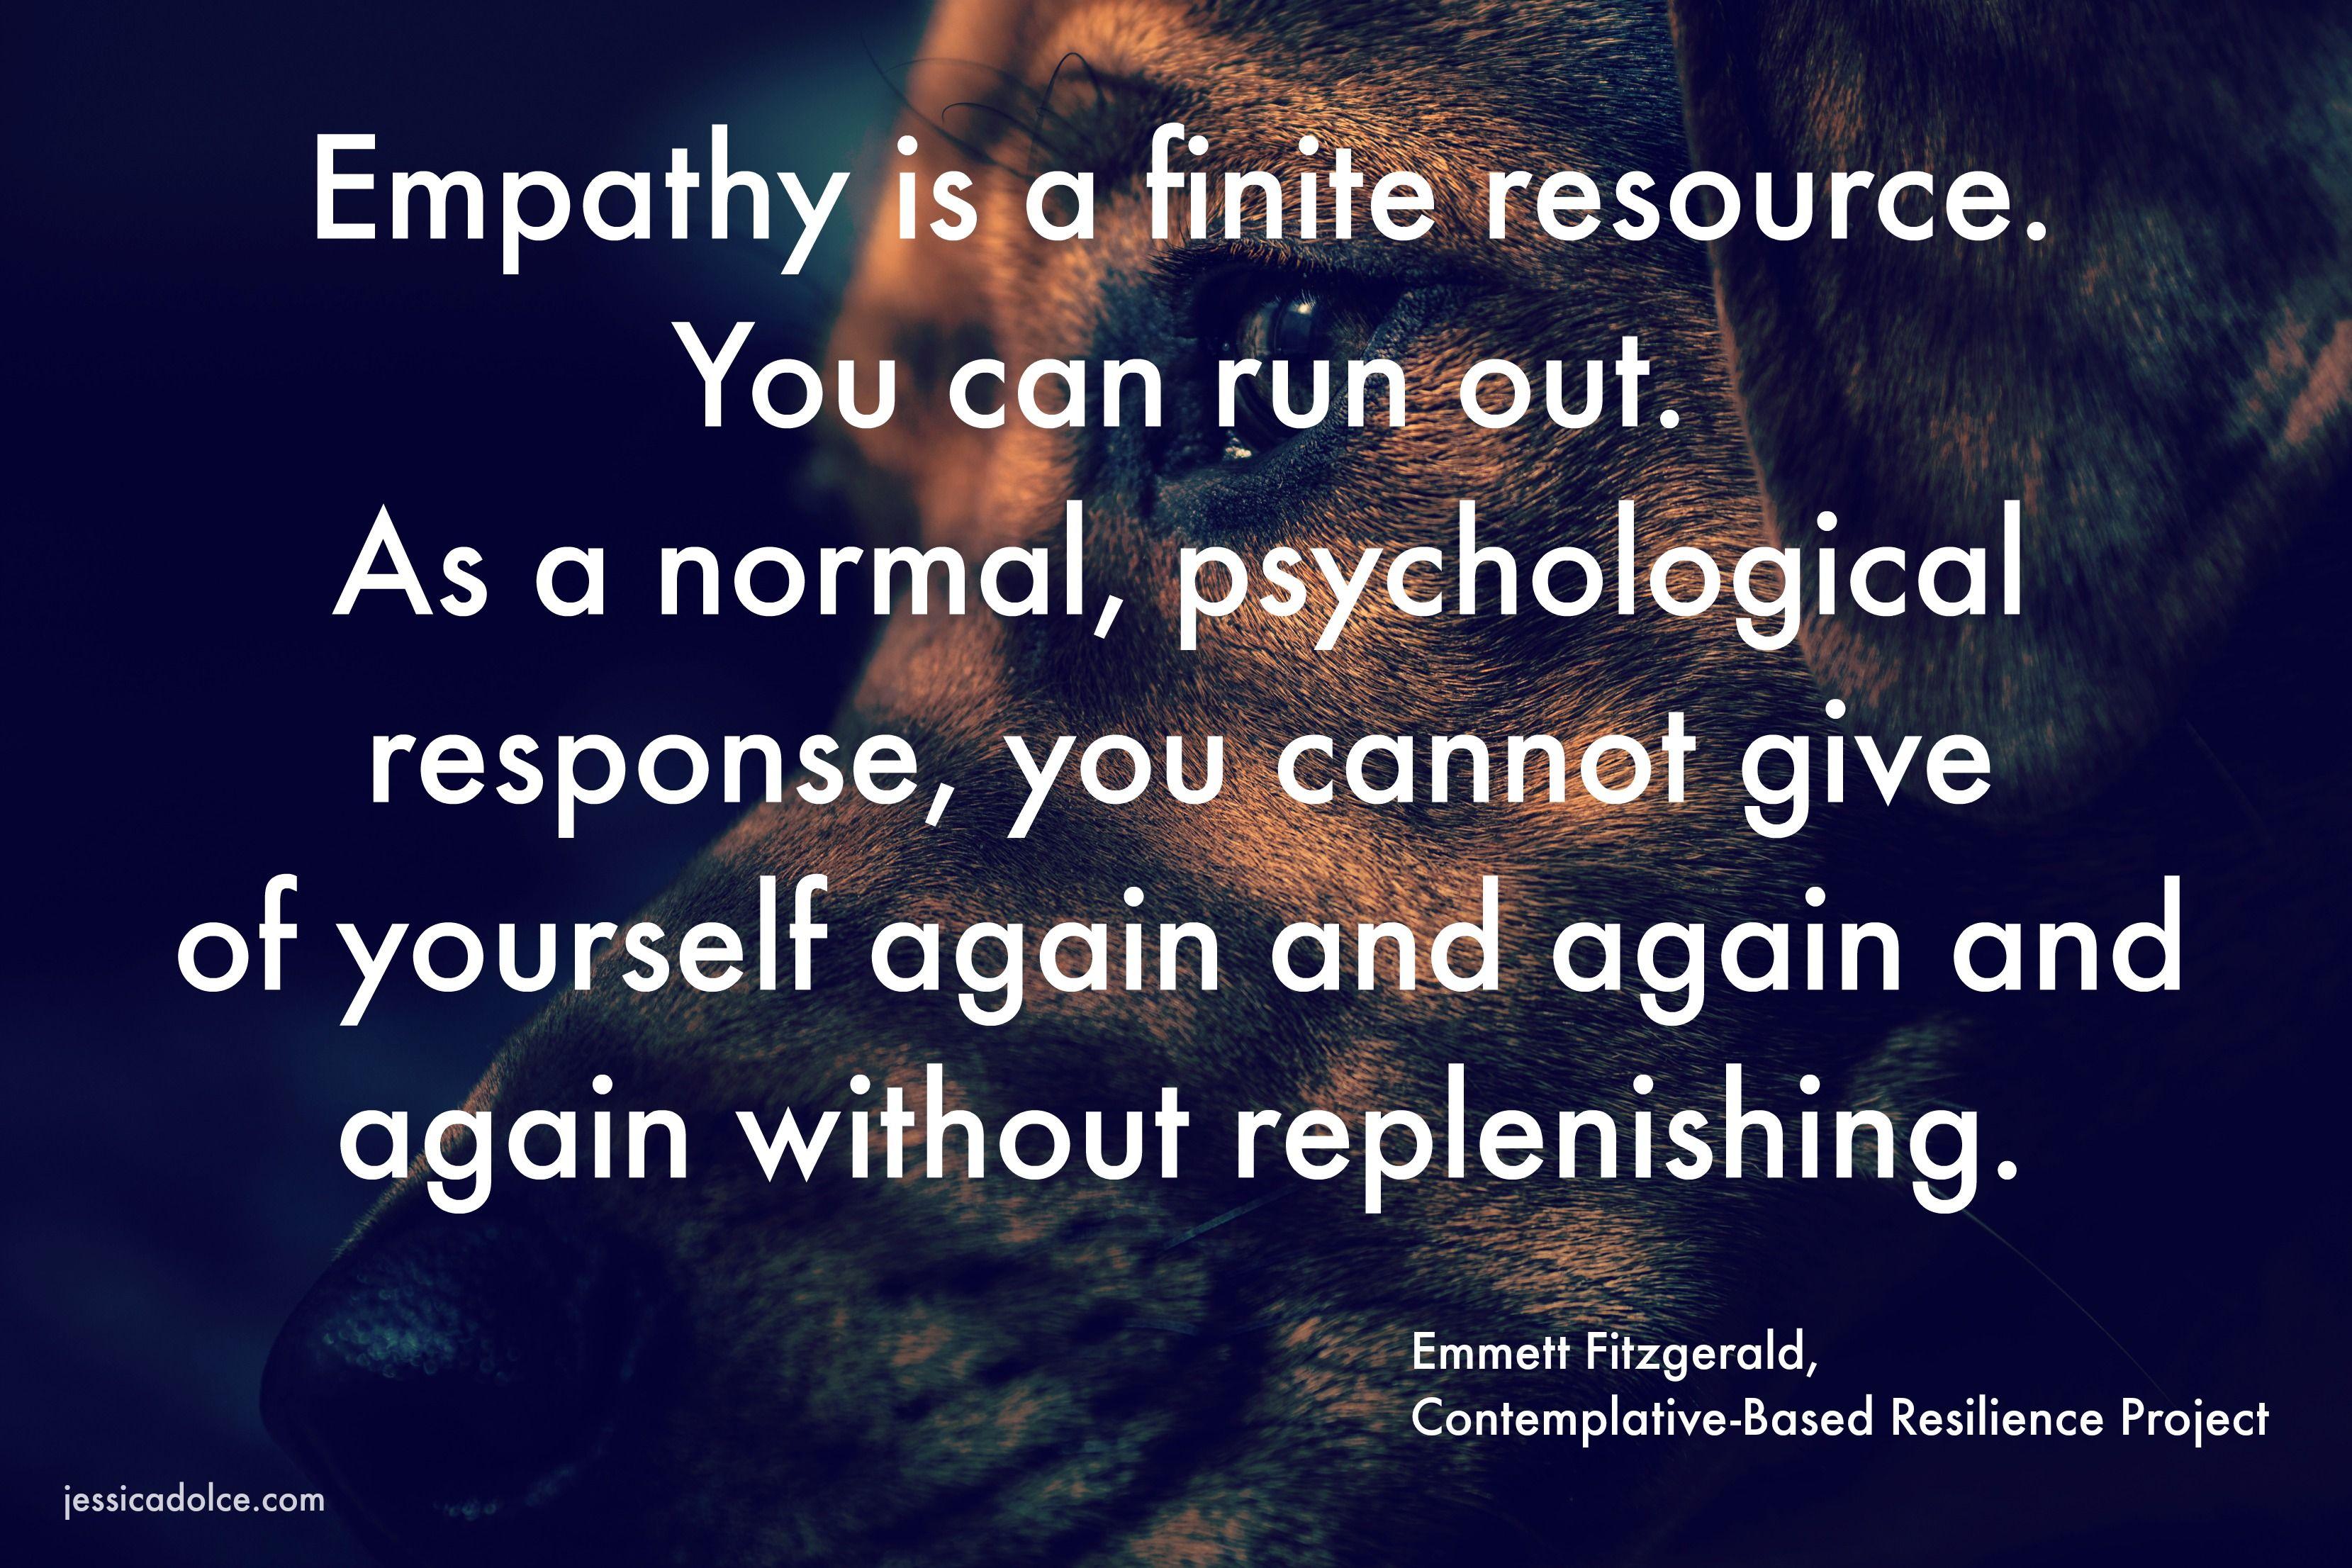 10 Compassion fatigue ideas | compassion fatigue, compassion, fatigue